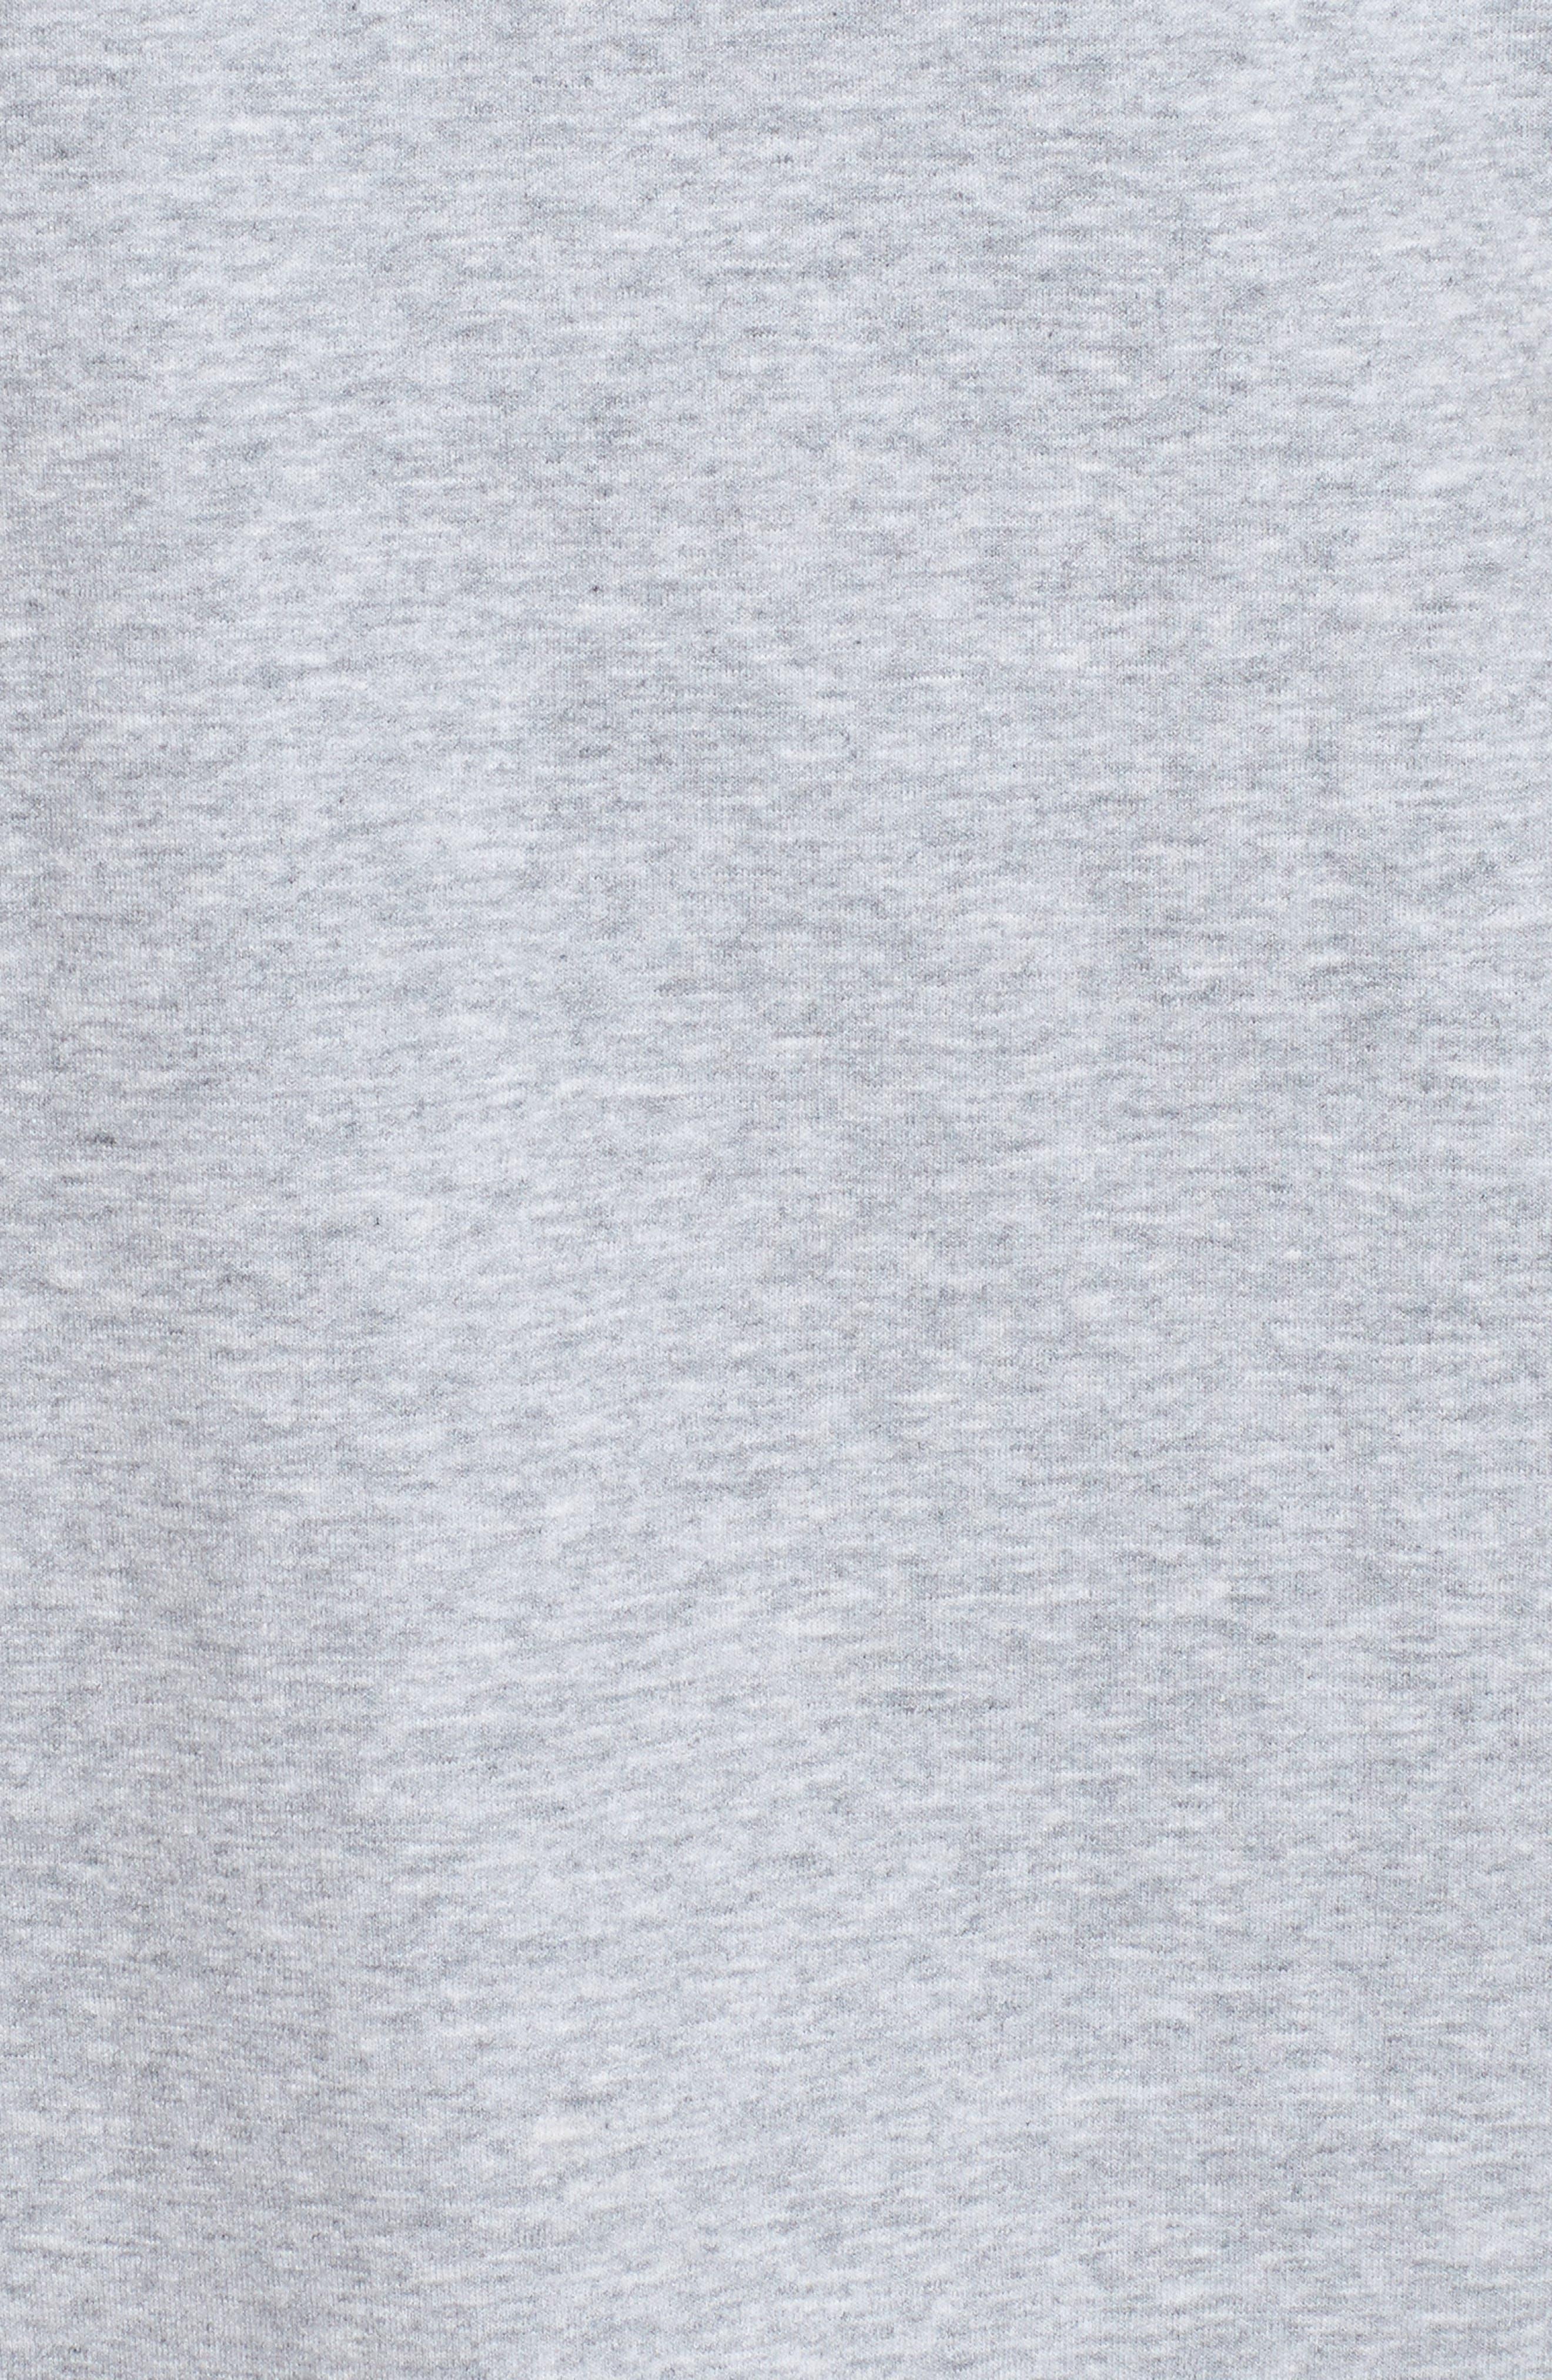 Daffic Sweatshirt Dress,                             Alternate thumbnail 5, color,                             020